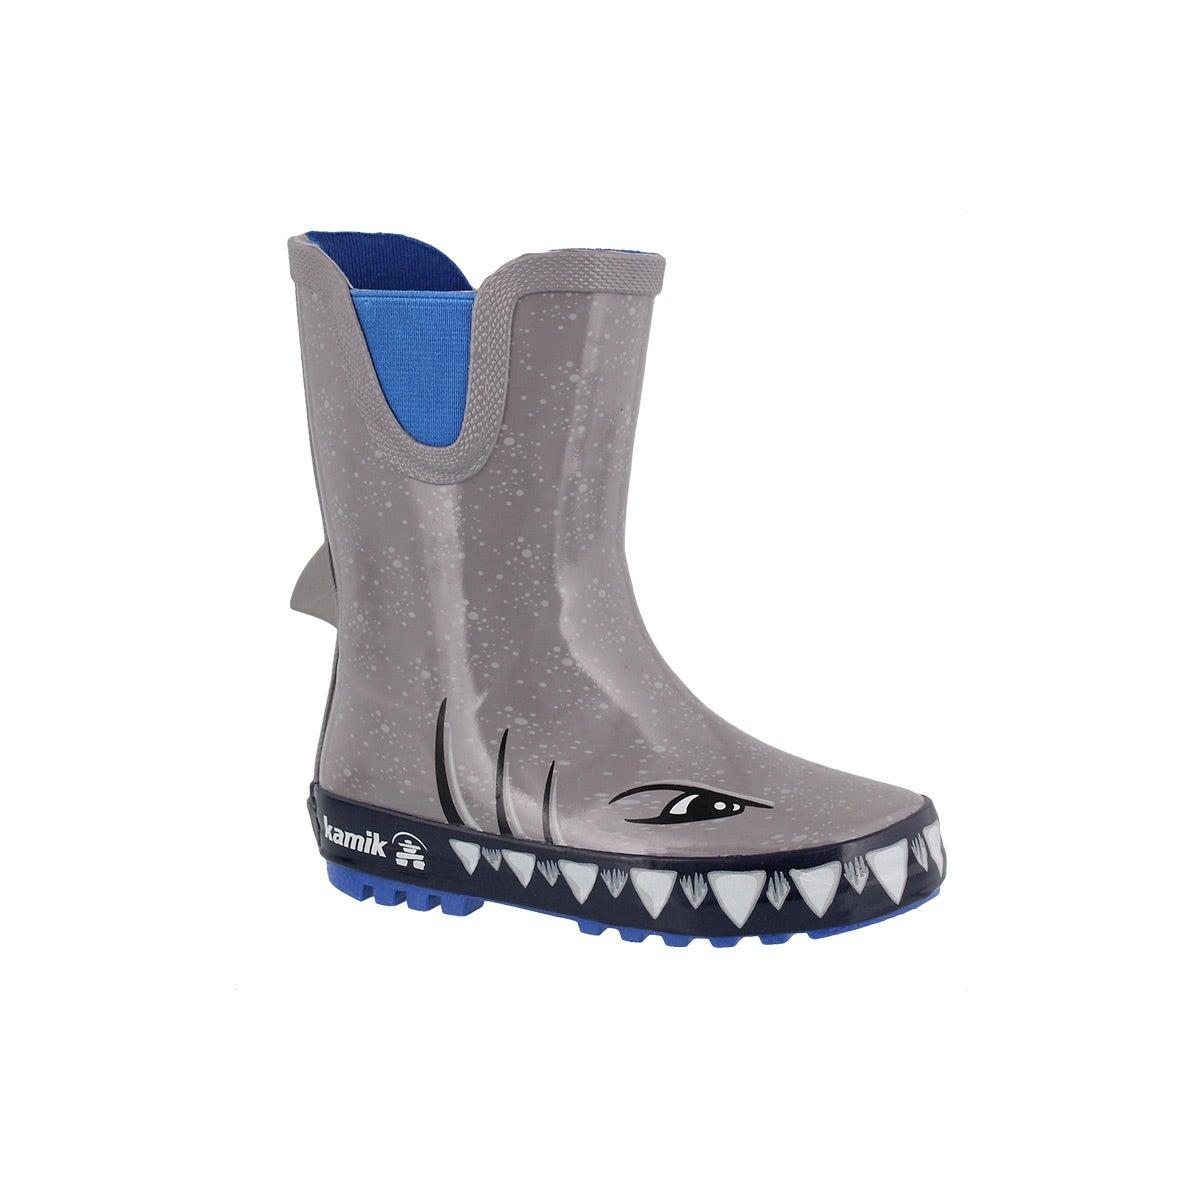 Infants' SHARKY grey waterproof rain boots